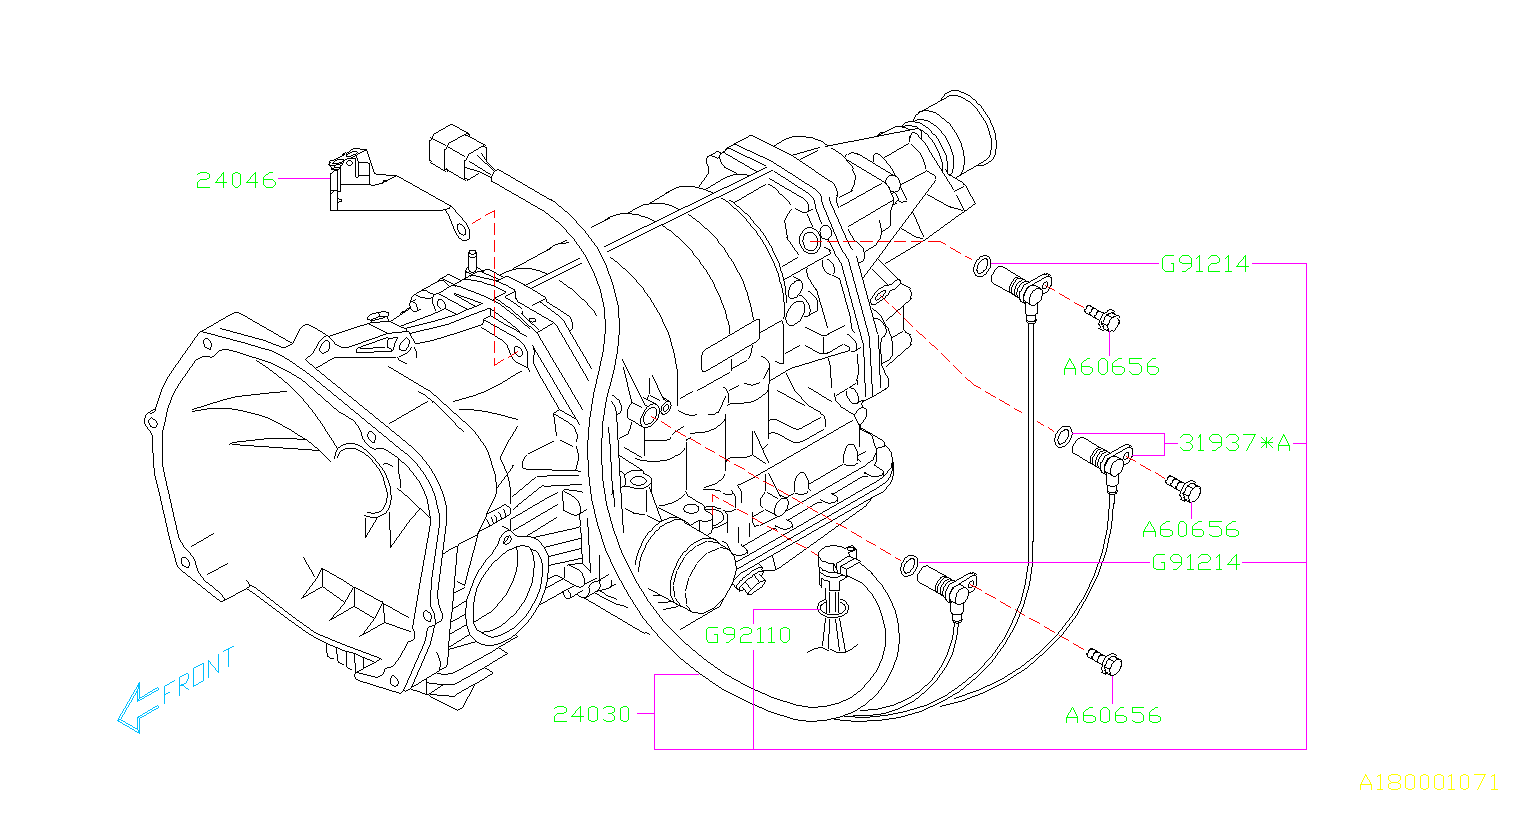 2006 Subaru Tribeca Sensor and harness assembly